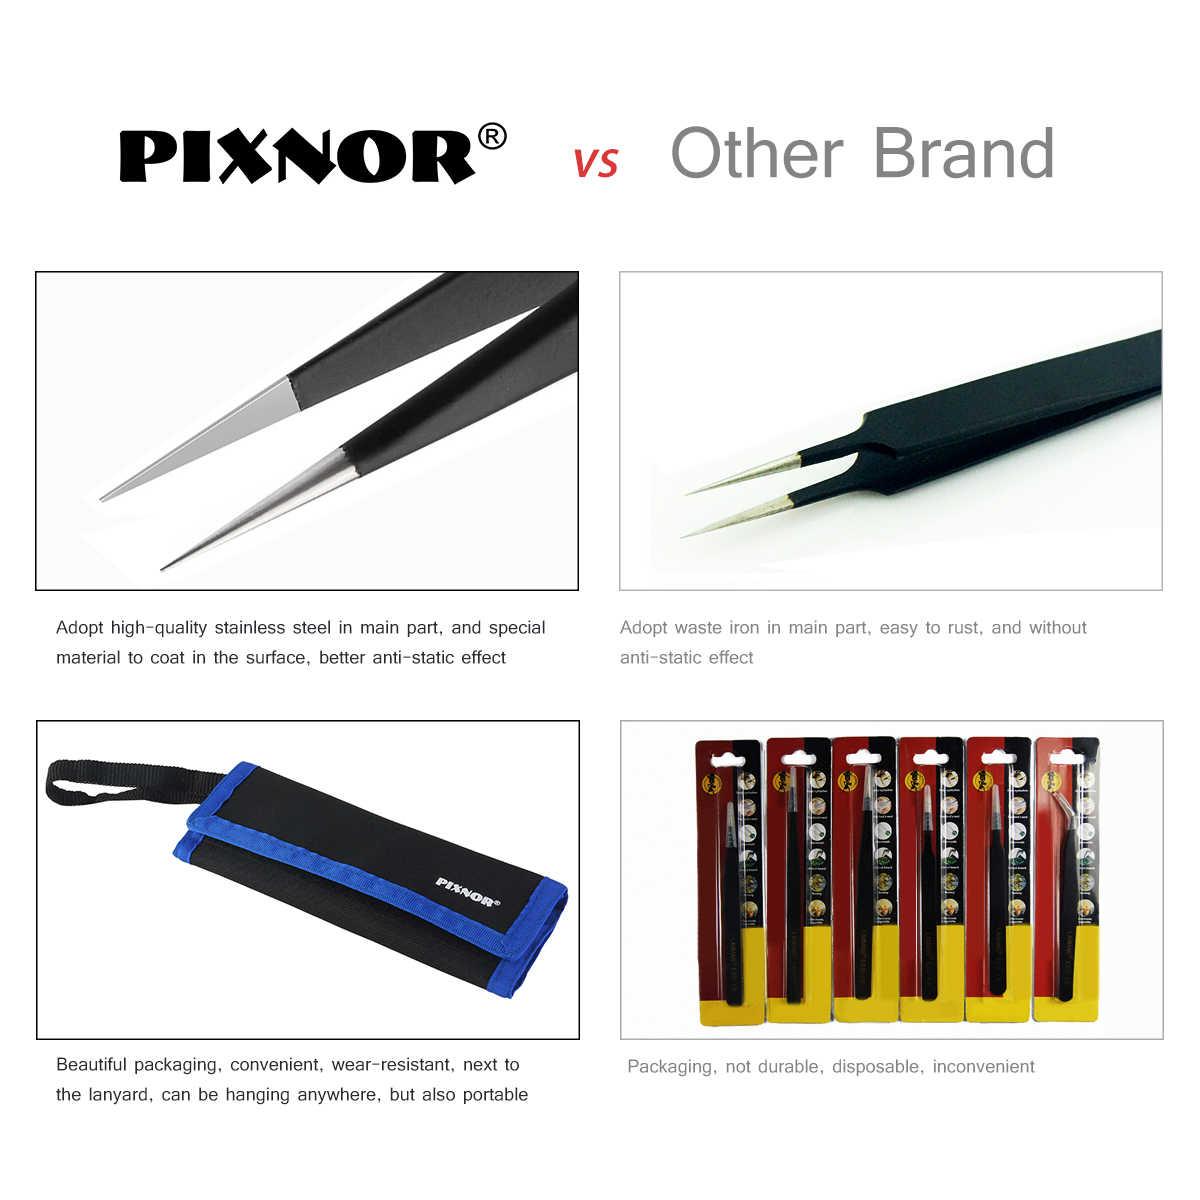 Pixnor 9 Pcs ESD Pinset Alat Kit Presisi Antistatik Tip Melengkung Lurus Stainless Steel Pinset Sesuatu Yg Menjentik Perbaikan Alat Baru